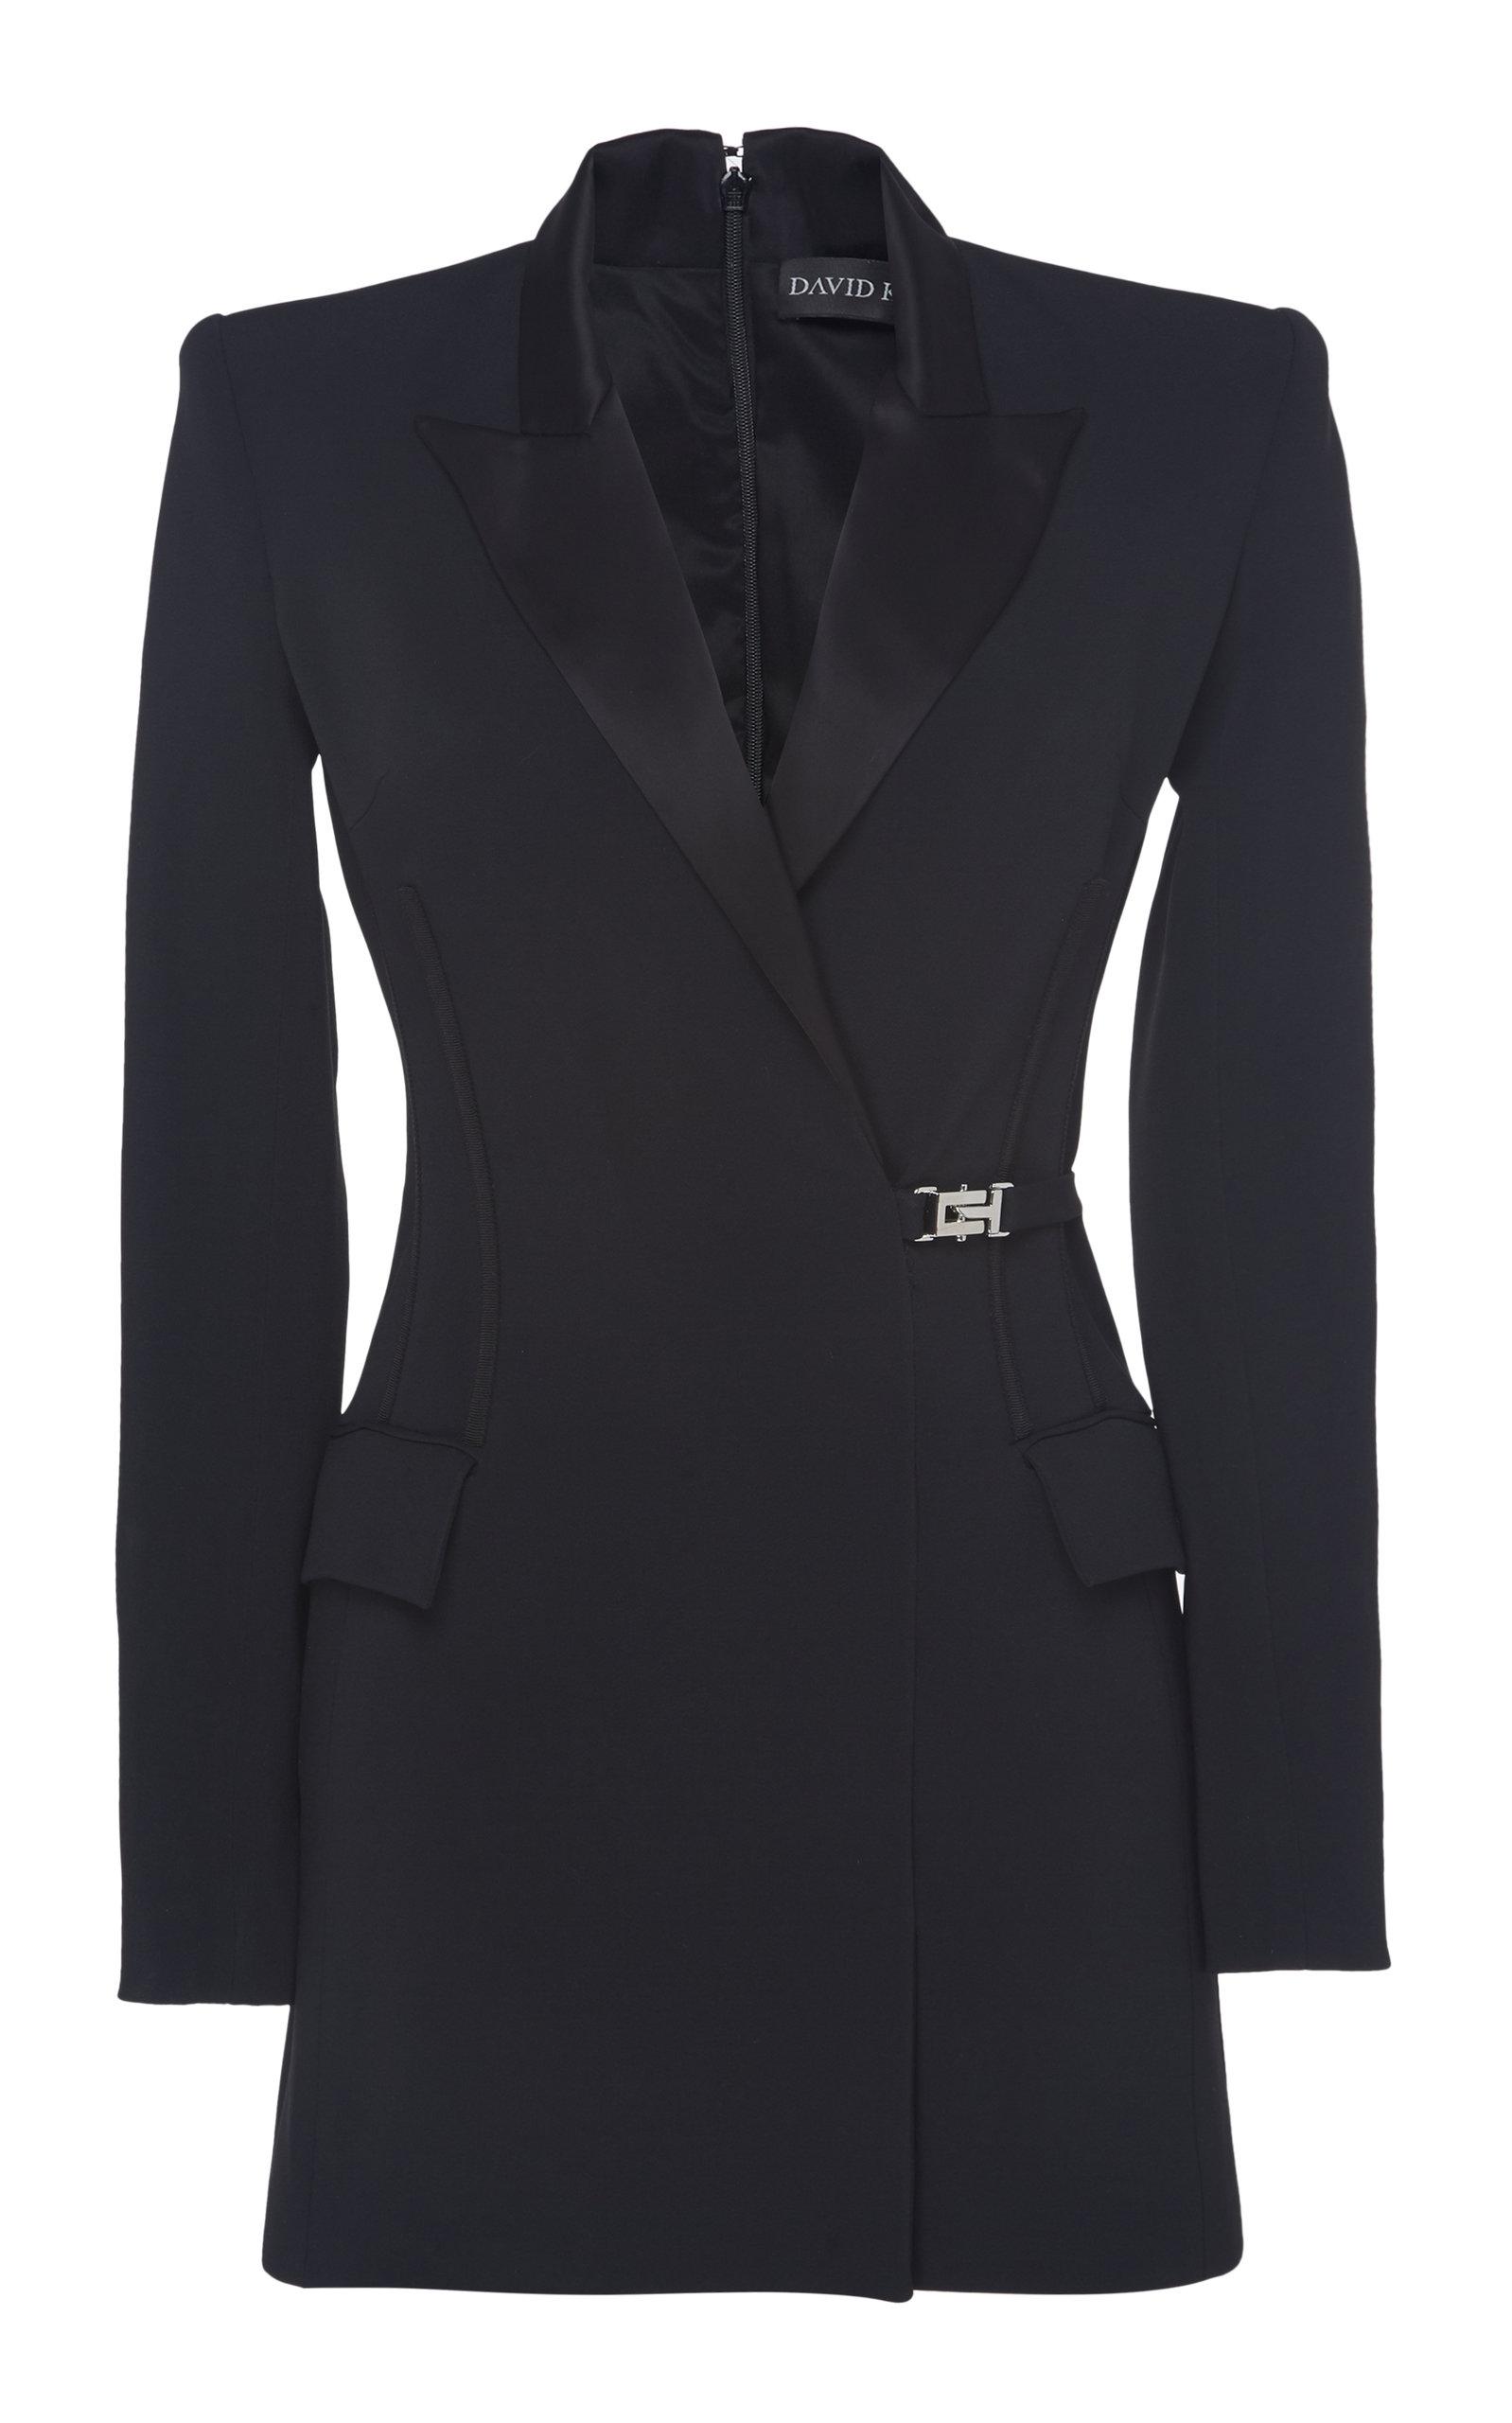 Buy David Koma Satin-Trimmed Buckled Mini Blazer Dress online, shop David Koma at the best price